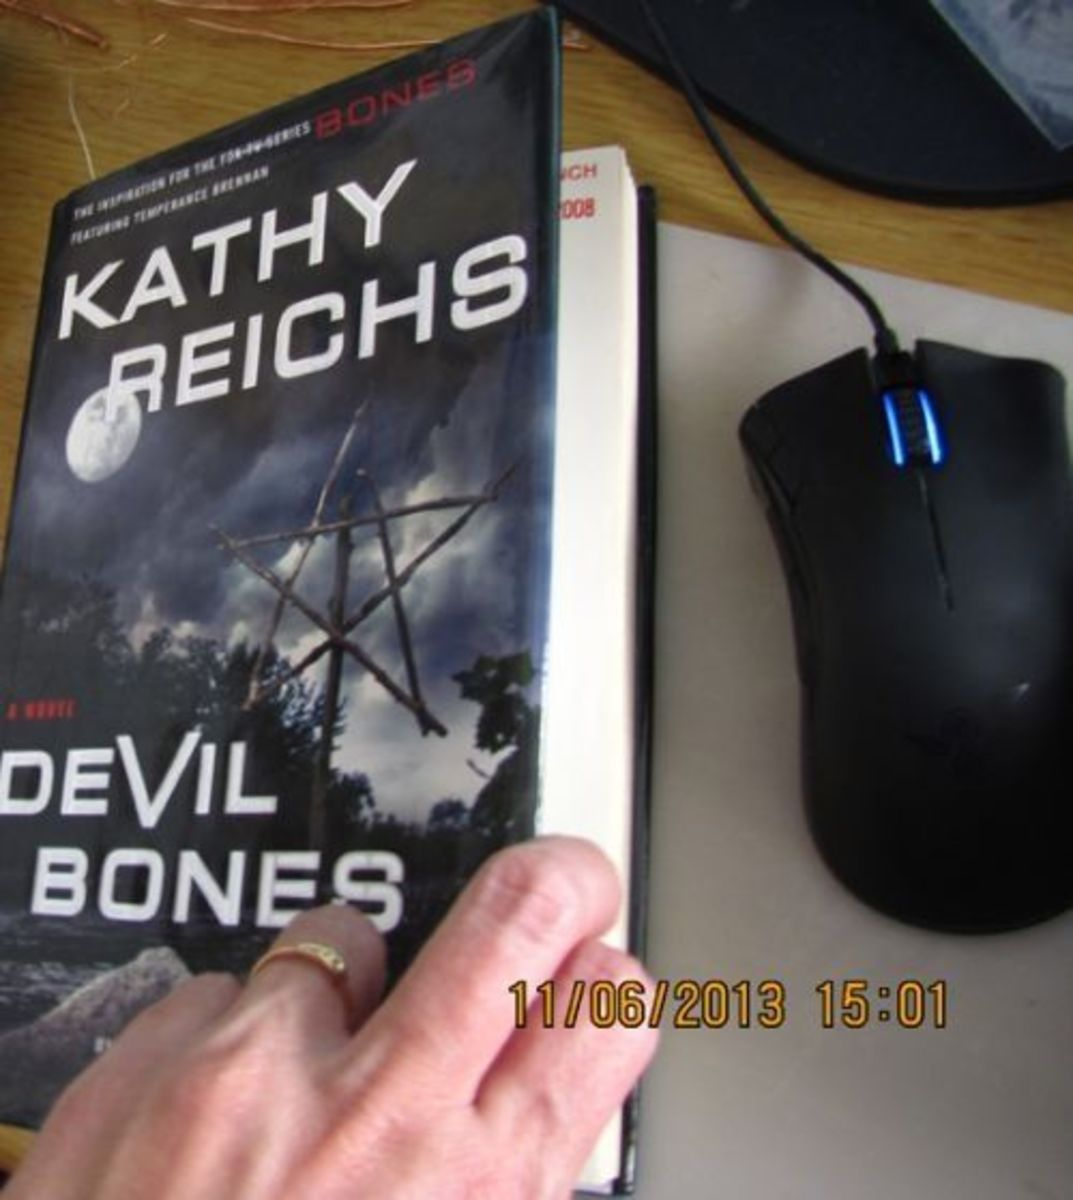 Devil Bones - my hardcover copy